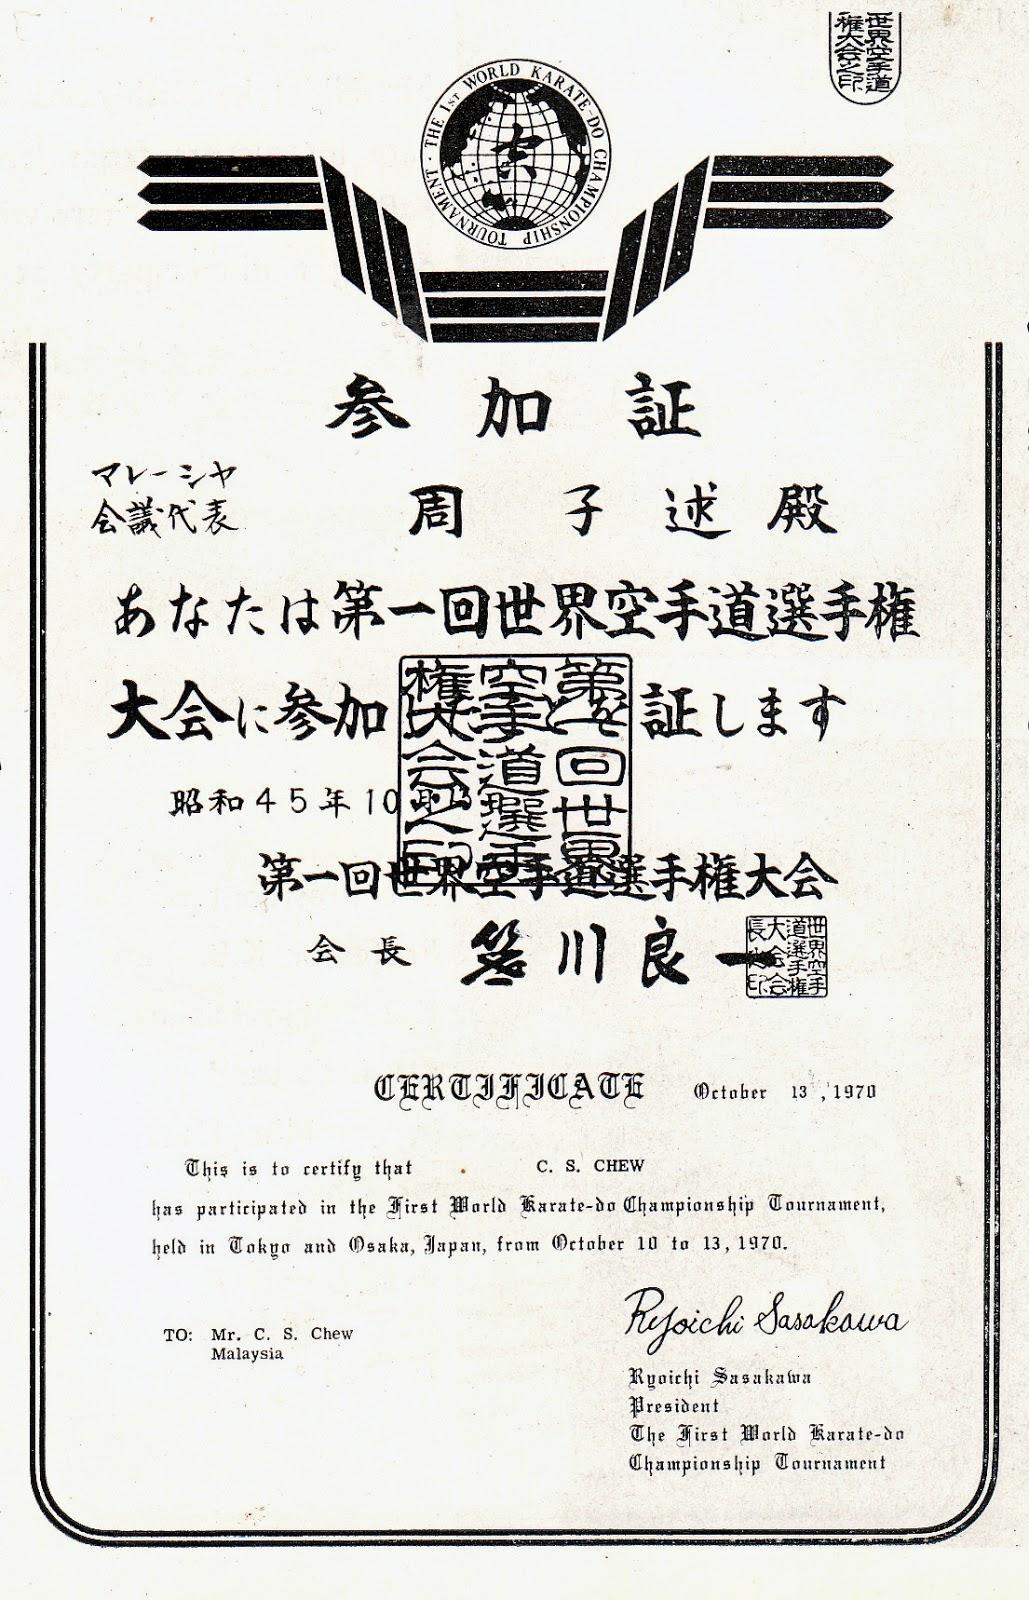 Budokan Karate International Council. (BKIC)